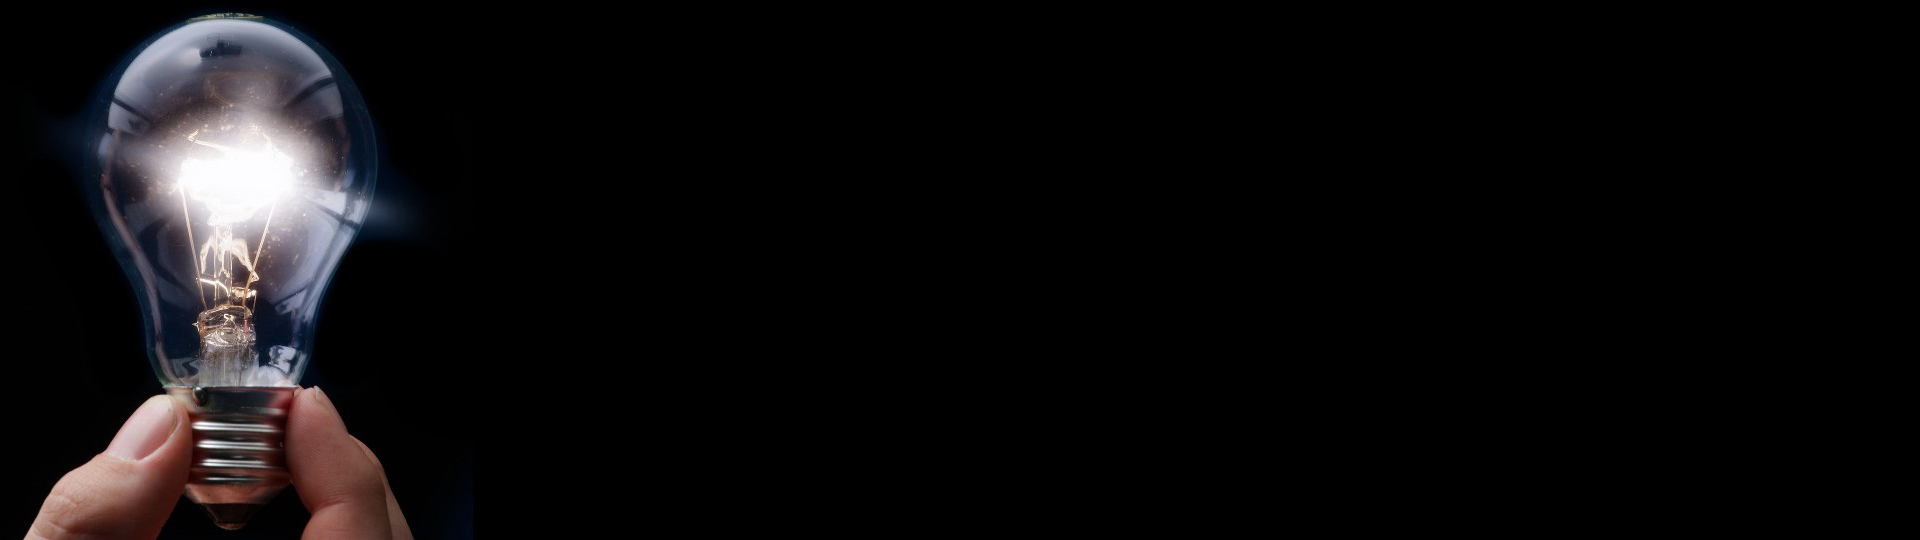 Holzhauer Slide 2 Licht